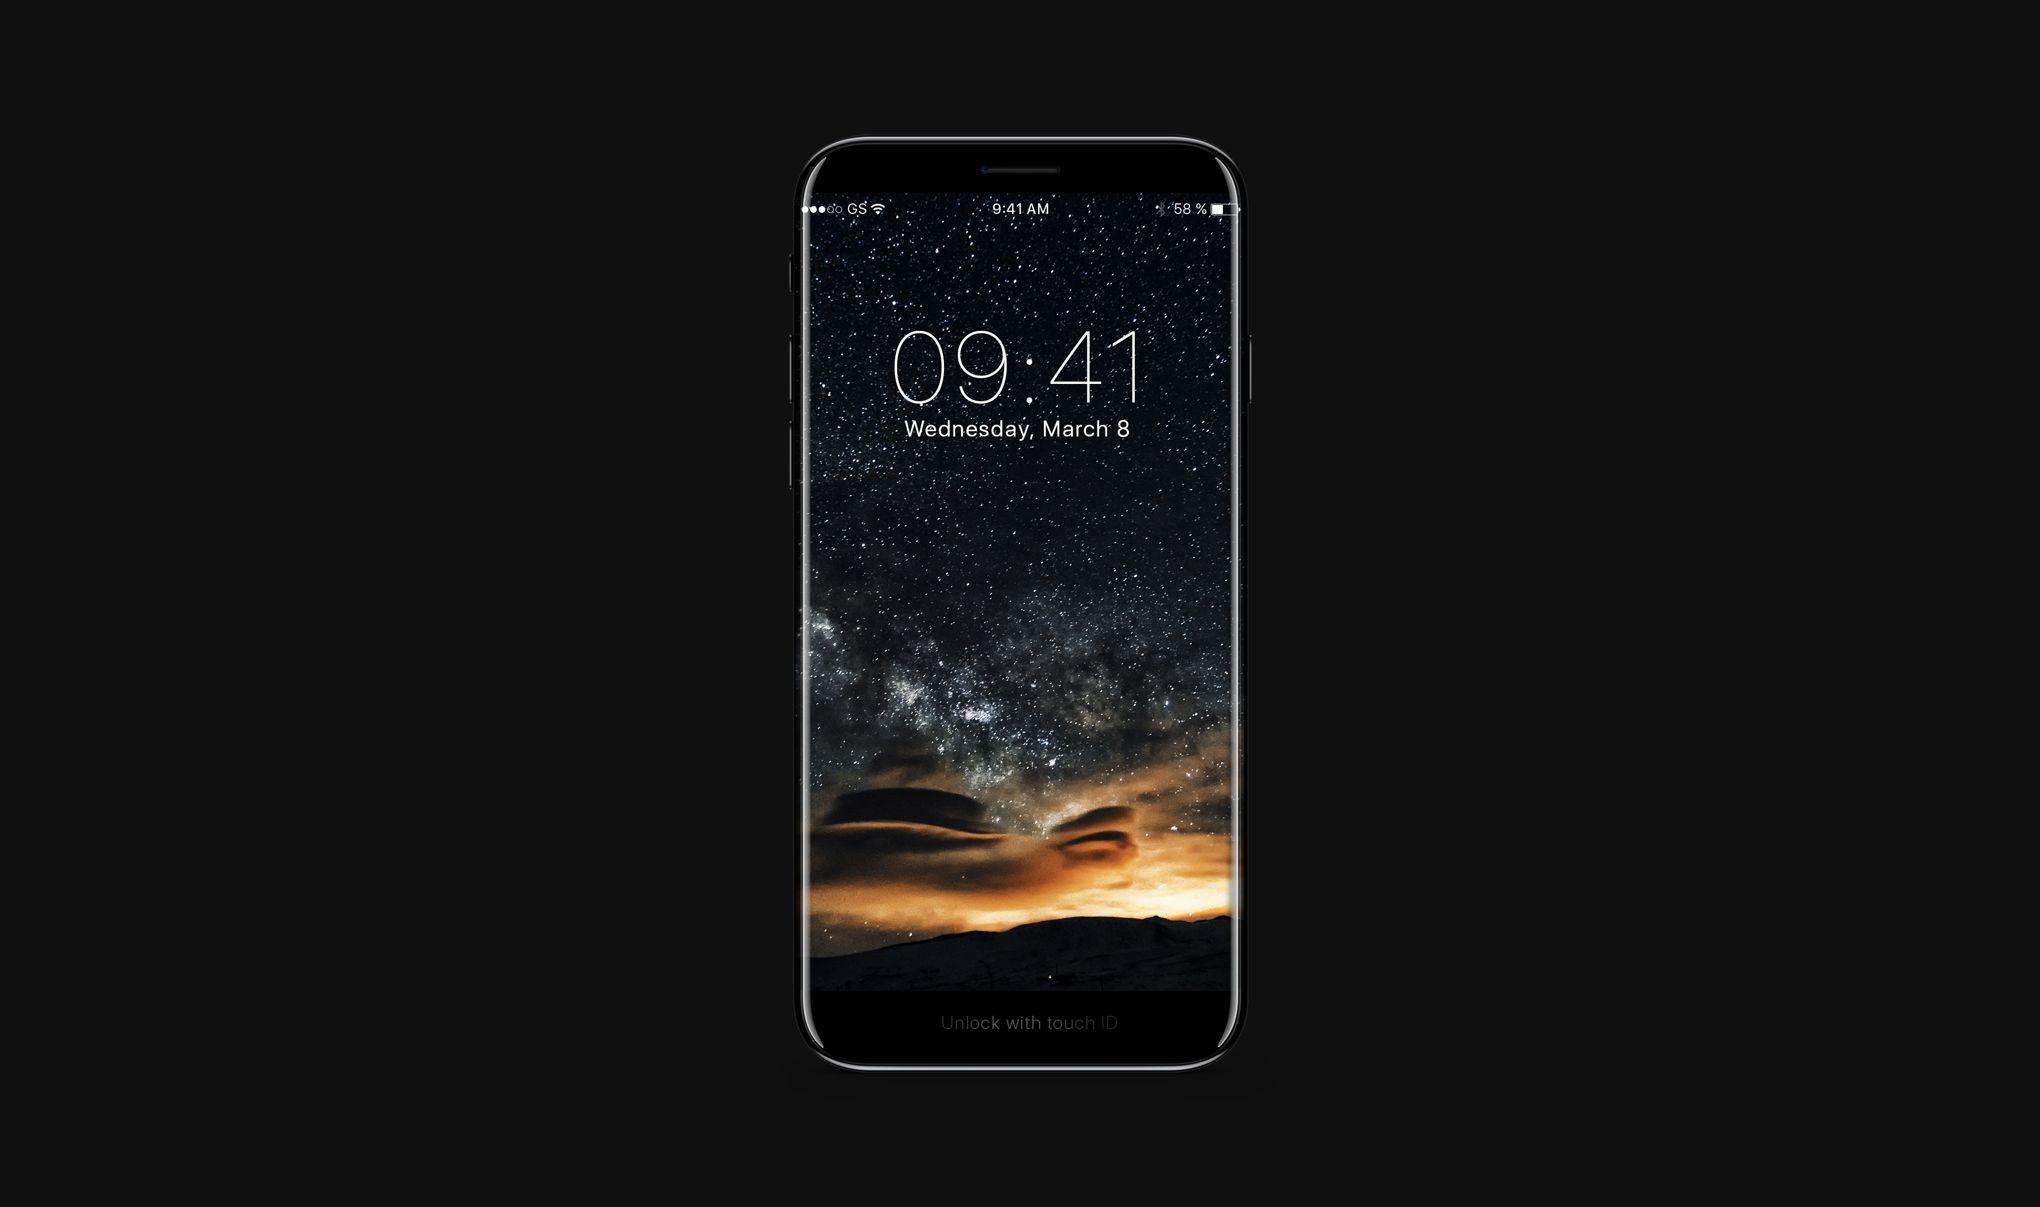 iphone 8 iphone edition date de sortie prix rumeurs. Black Bedroom Furniture Sets. Home Design Ideas